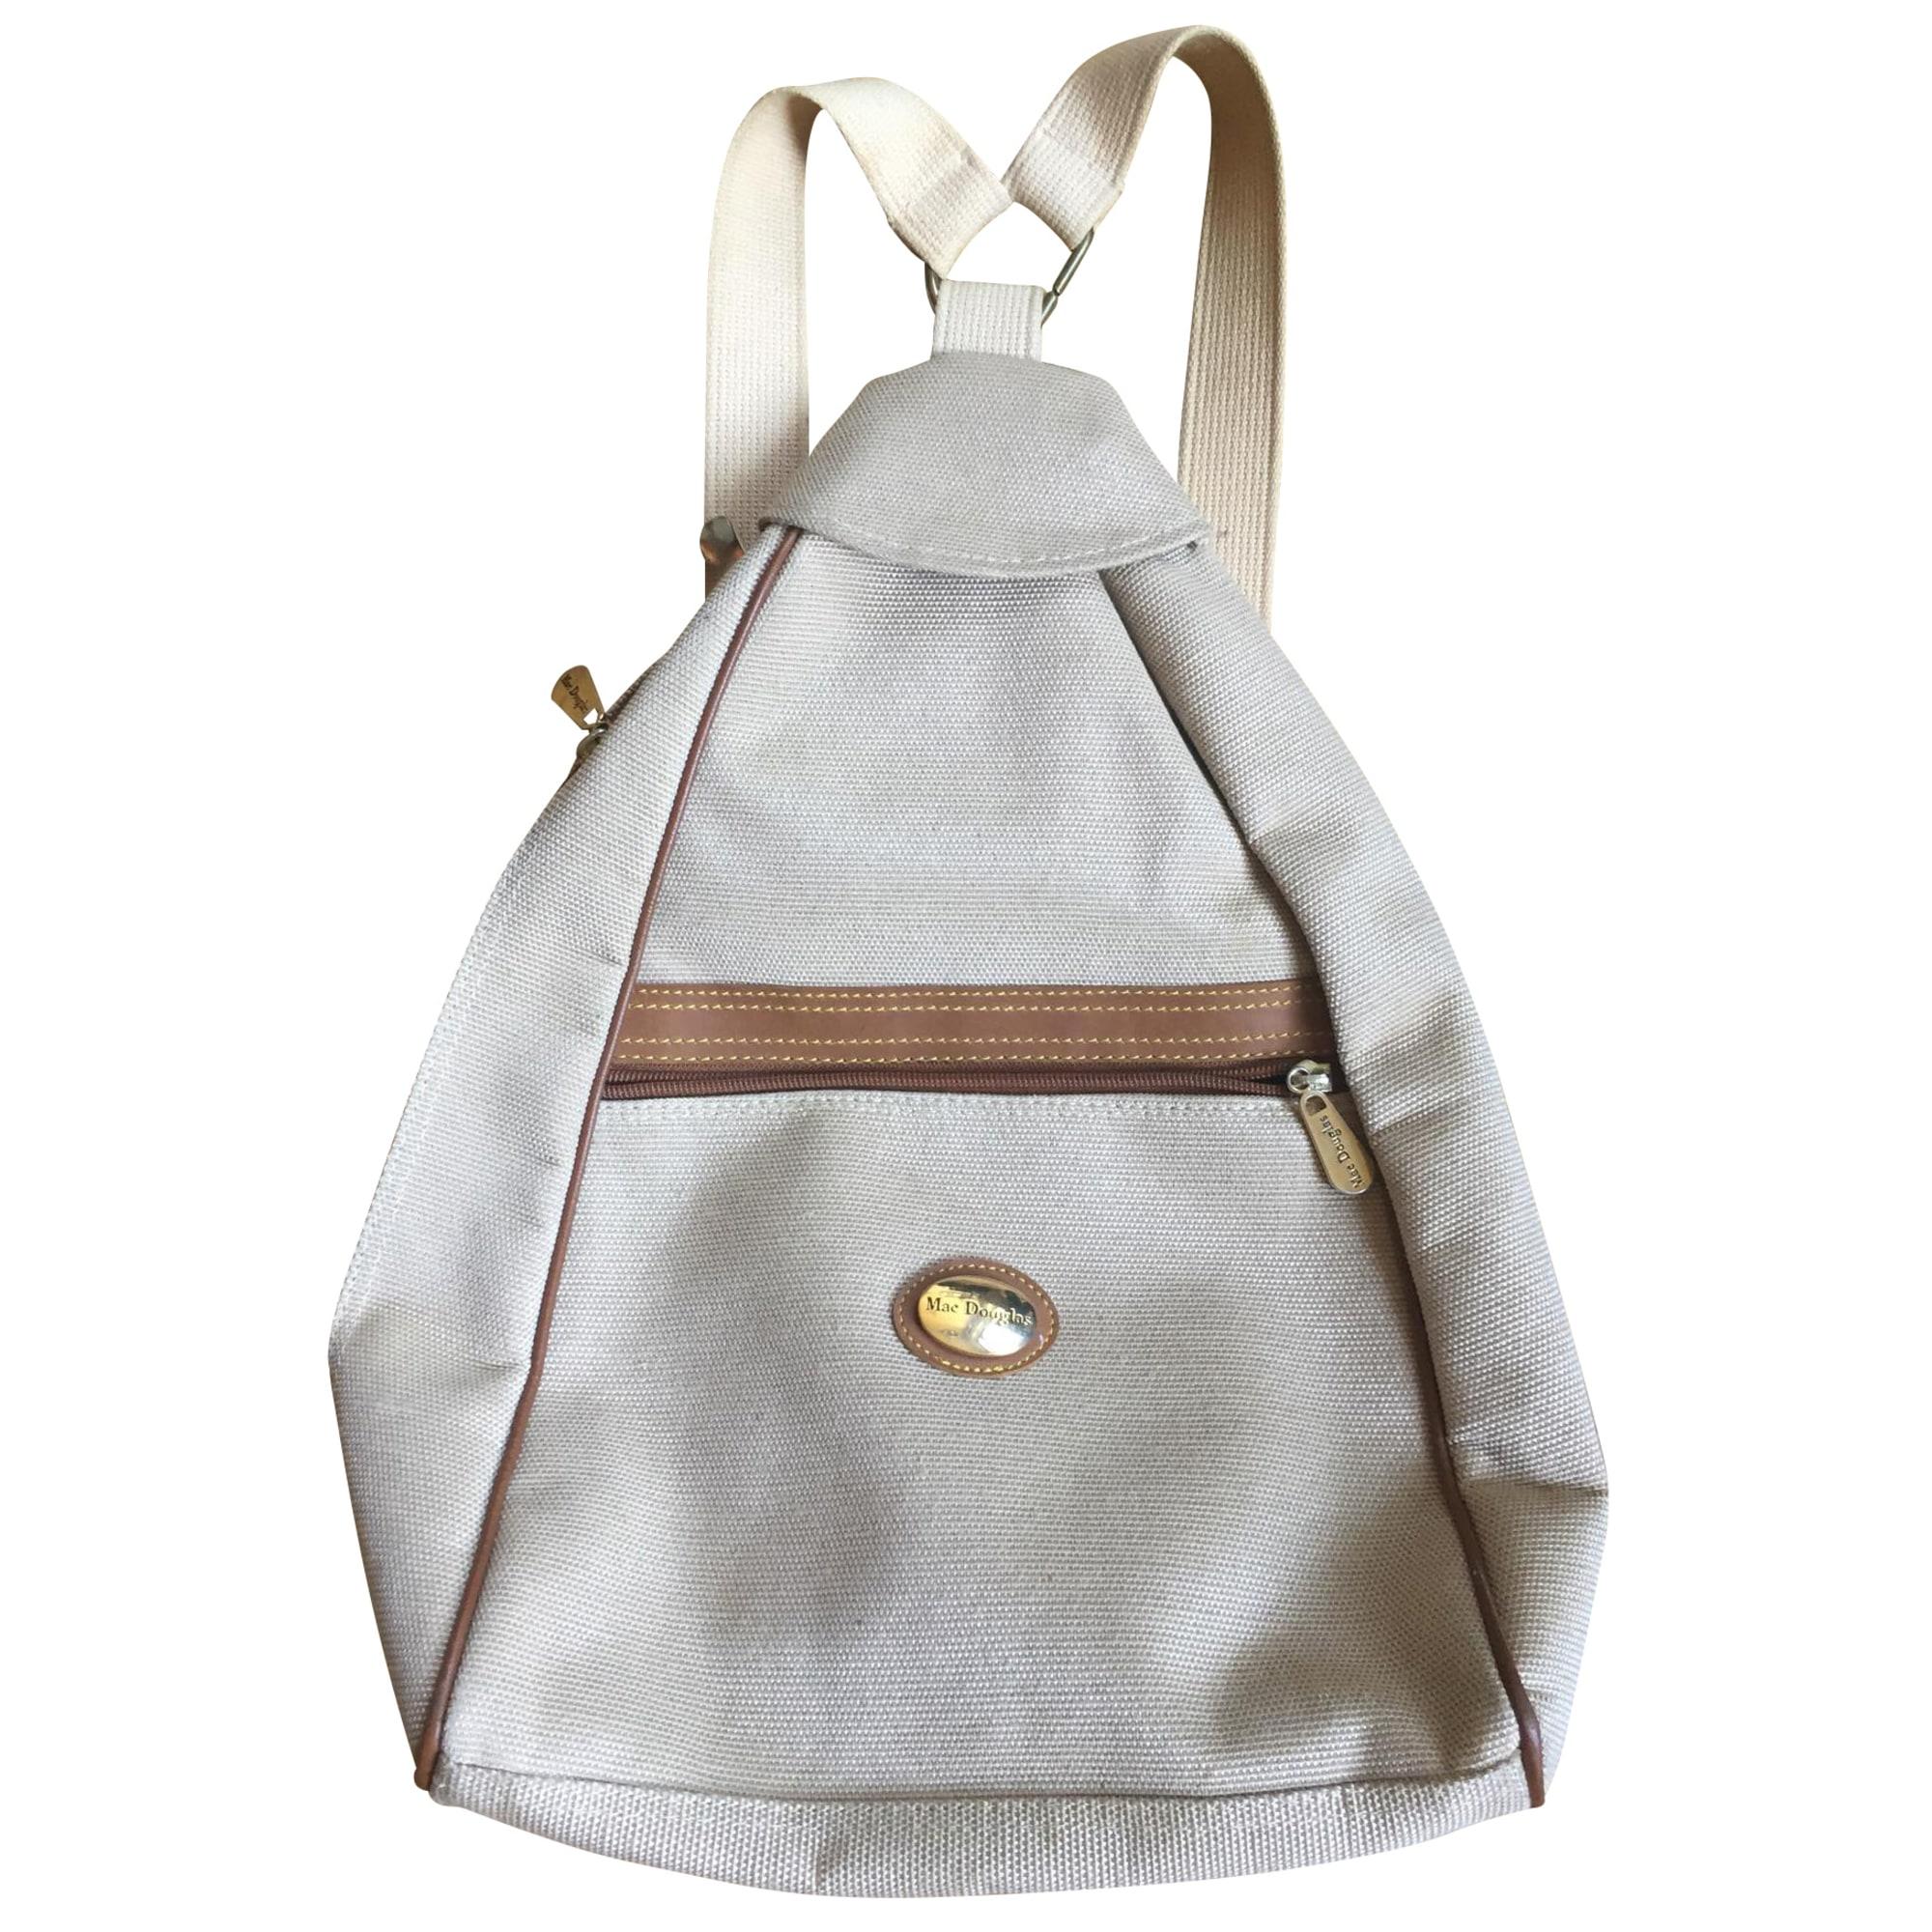 Backpack MAC DOUGLAS Beige, camel